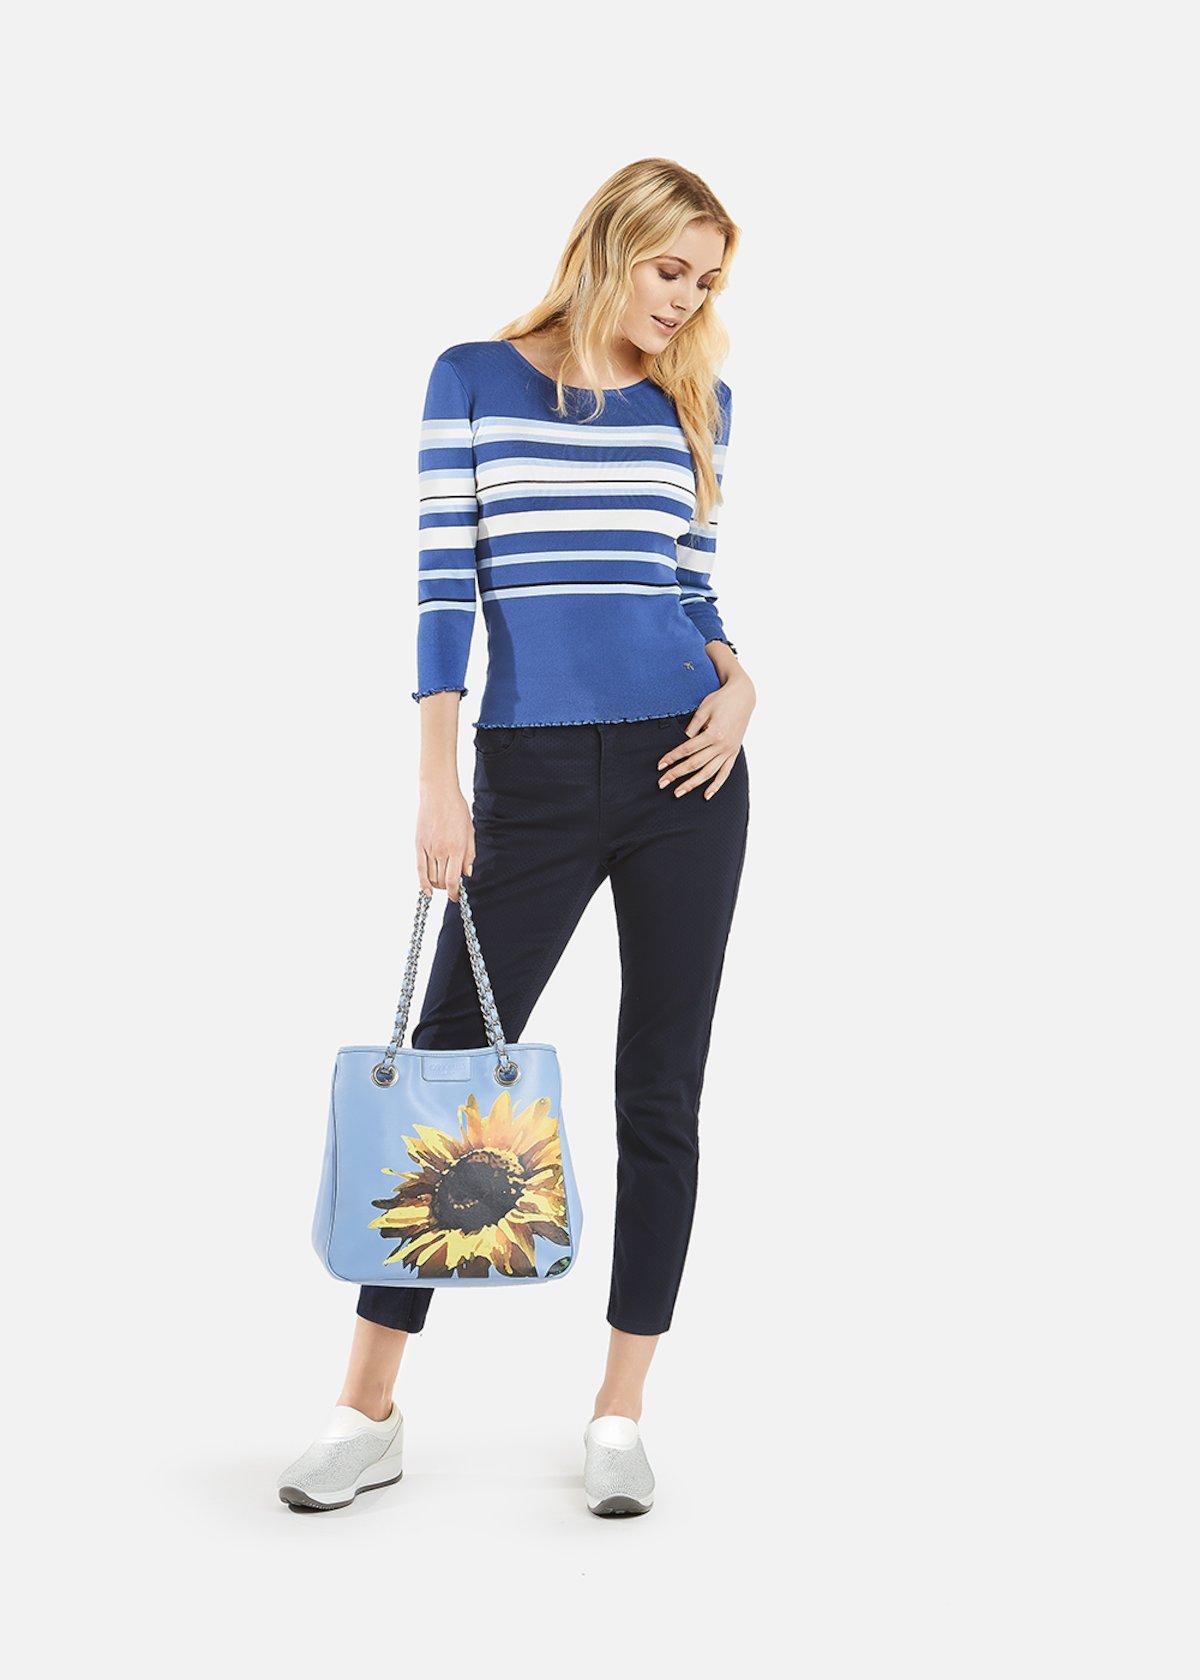 Moyra sweater stripes printed - Avion / Morning Stripes